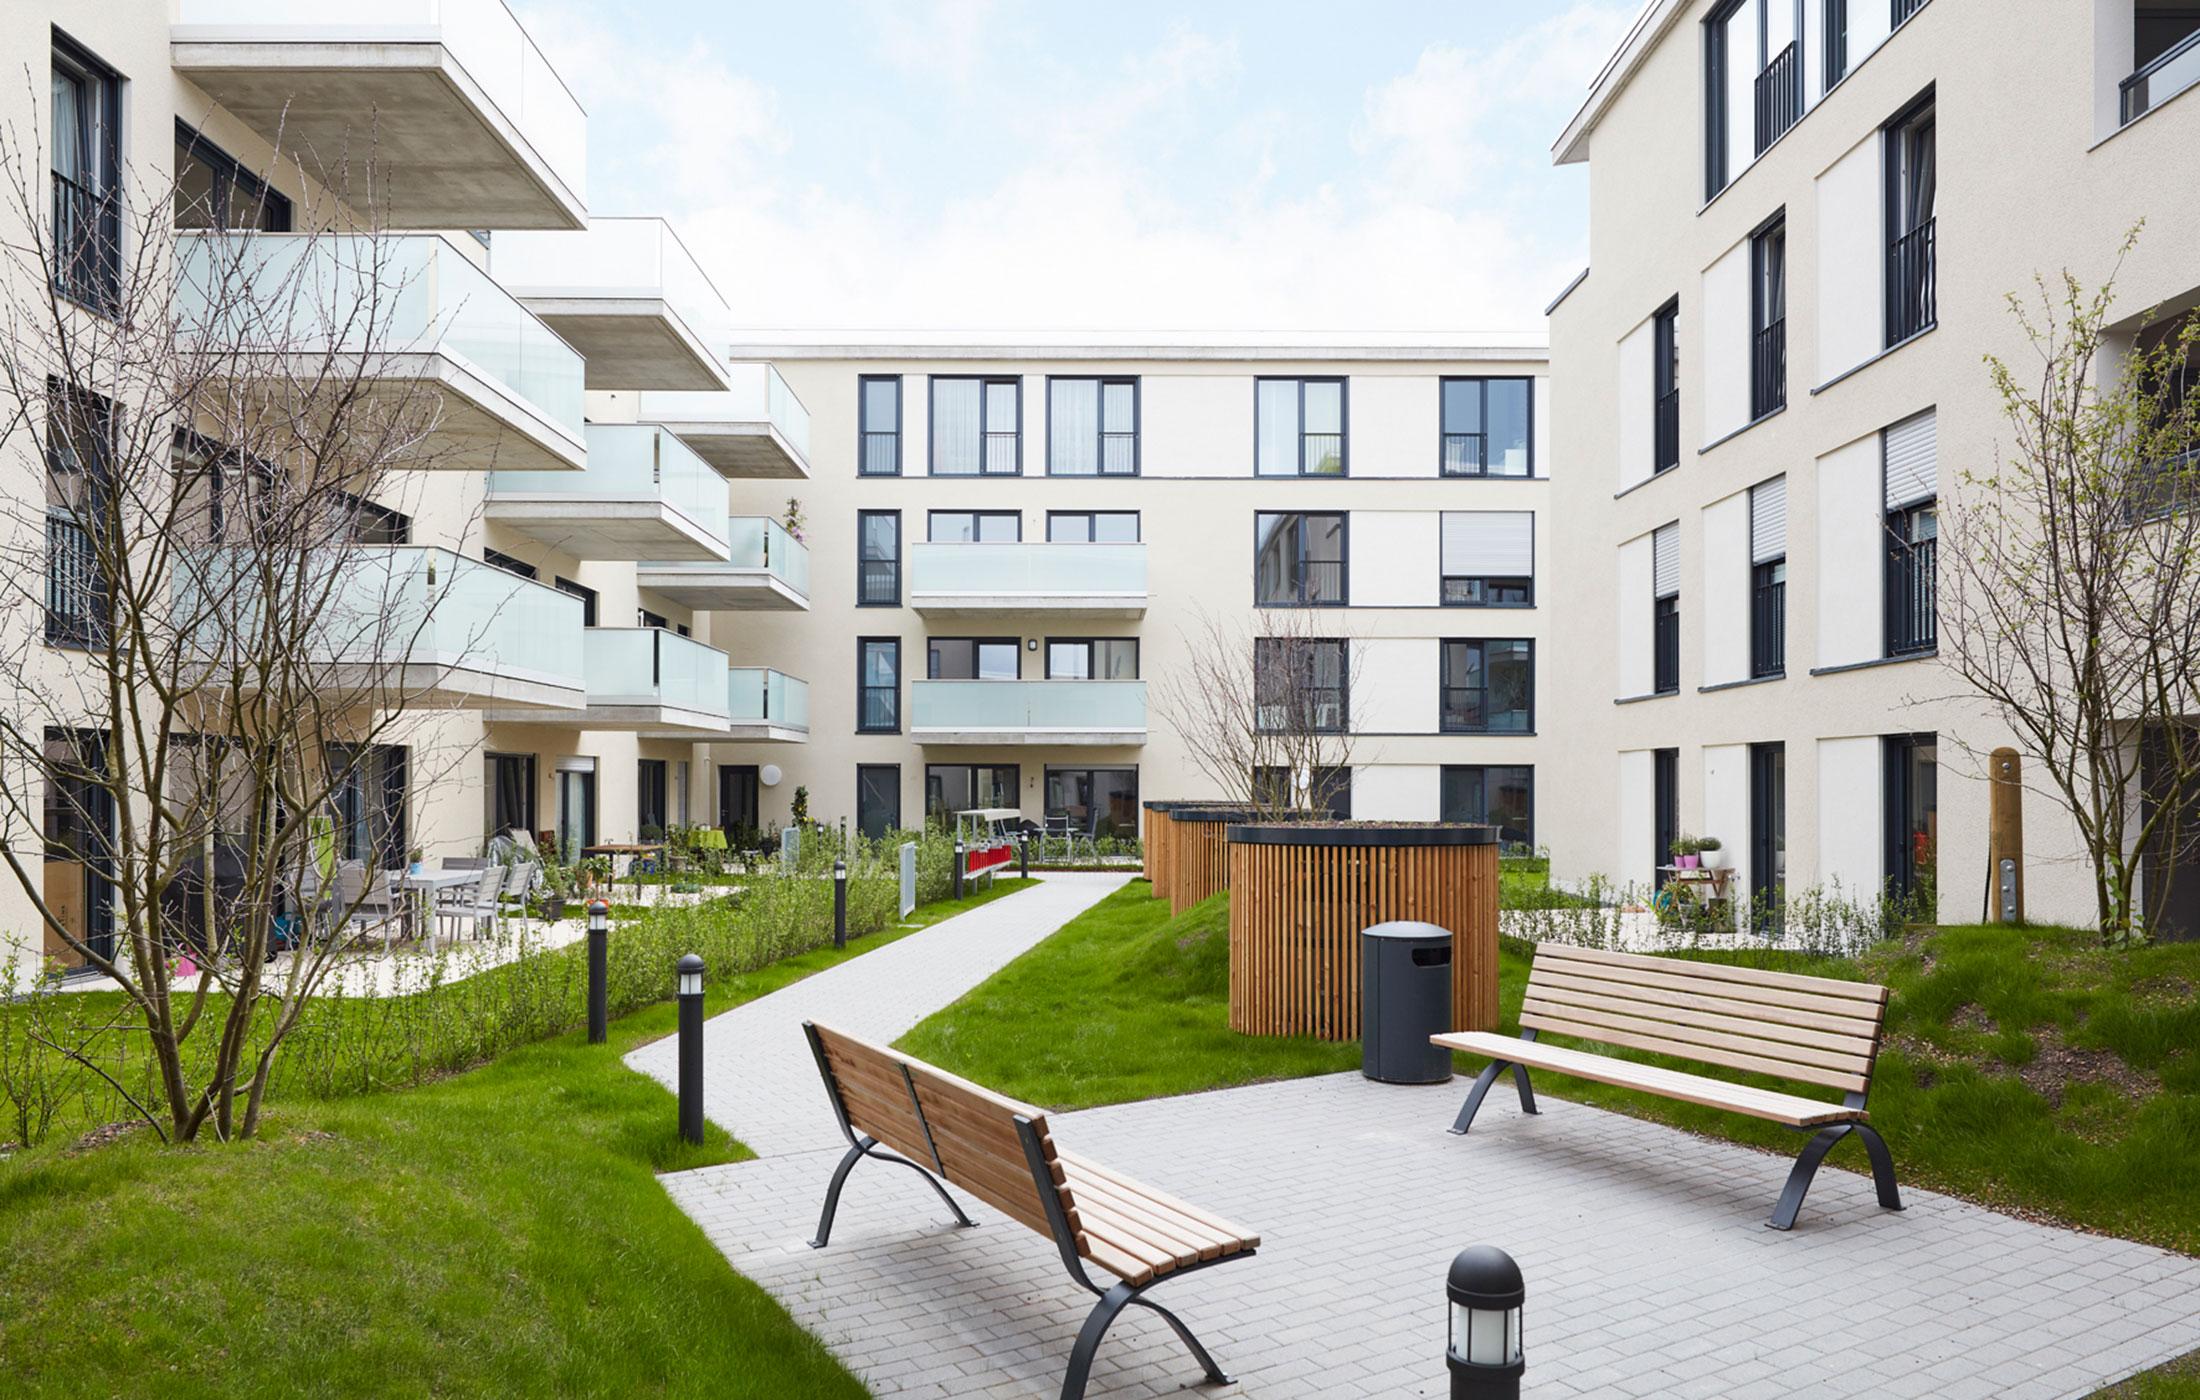 2017_Neubau_Wohnungsbau_Einzelhande_Generalplanung_Koroneo_Korntal_Edeka